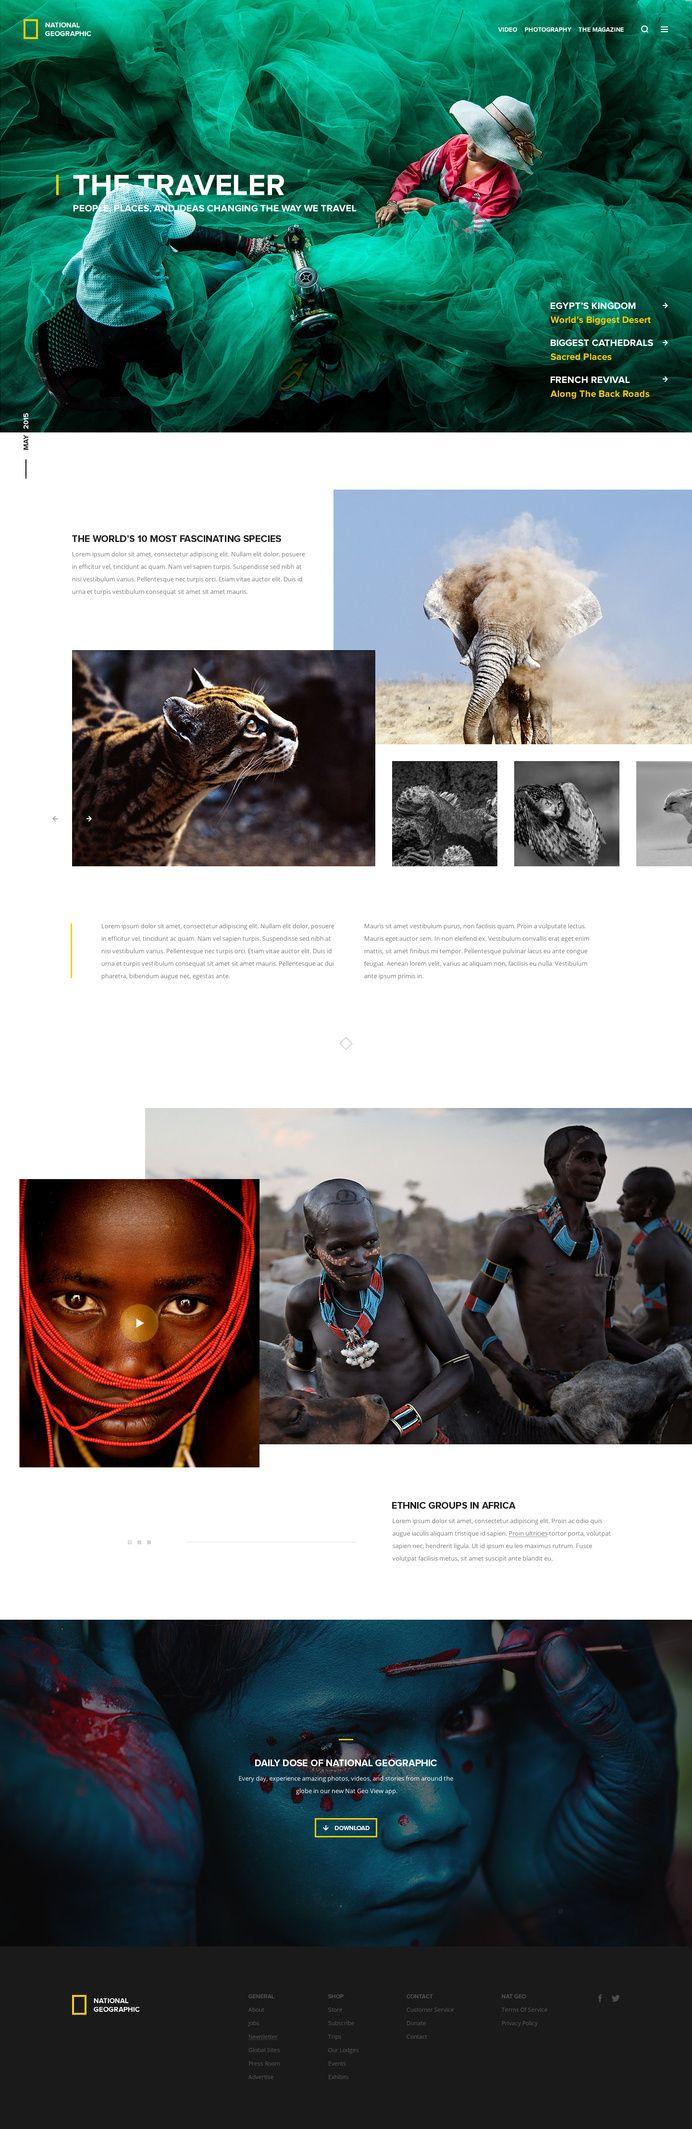 web site, digital